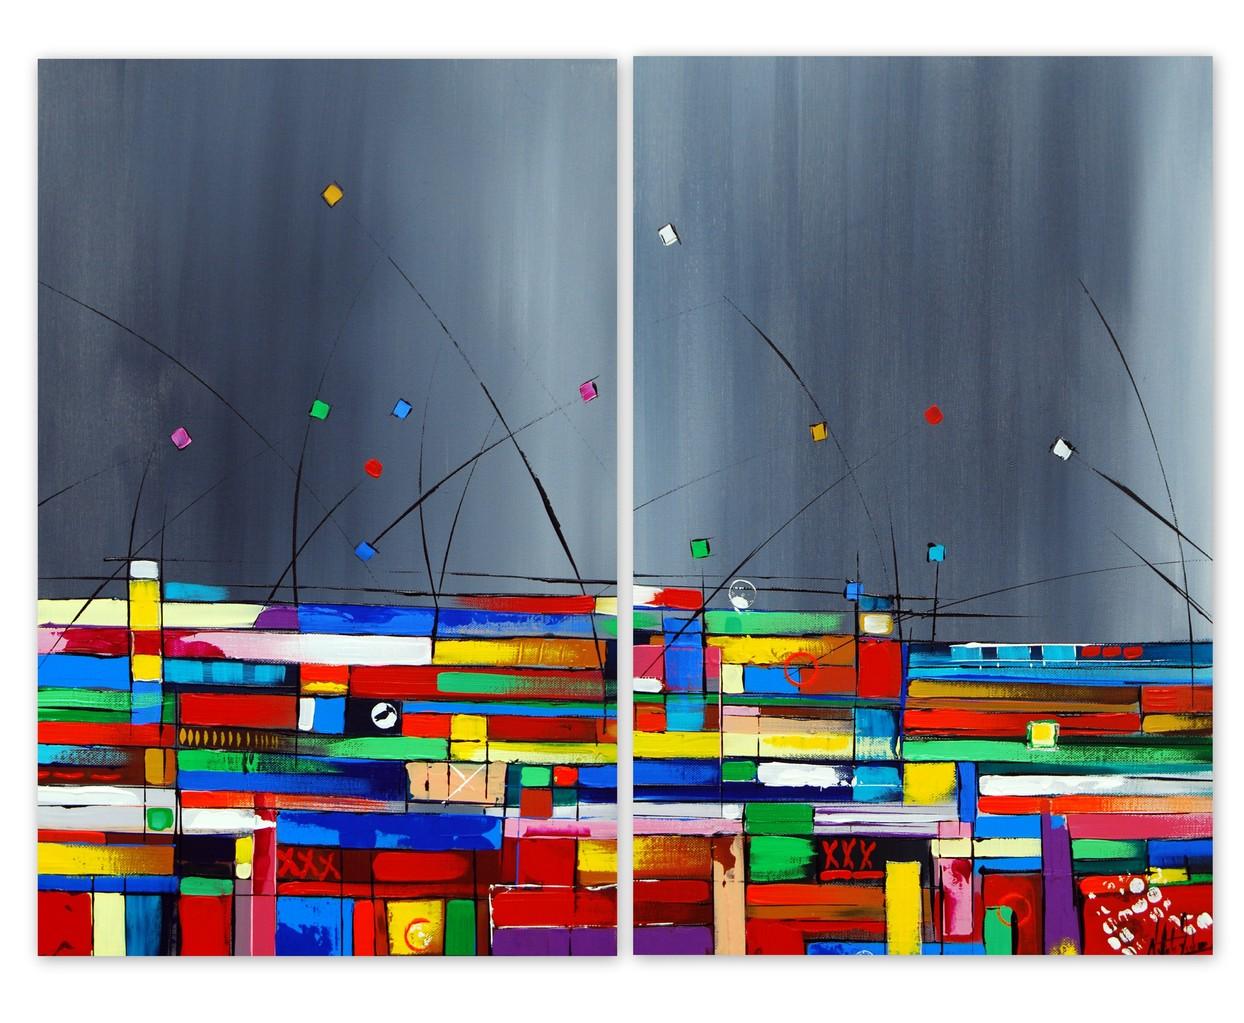 80 x 60 cm 2.teilig. Acryl auf Leinwand, Galeriekeilrahmen.